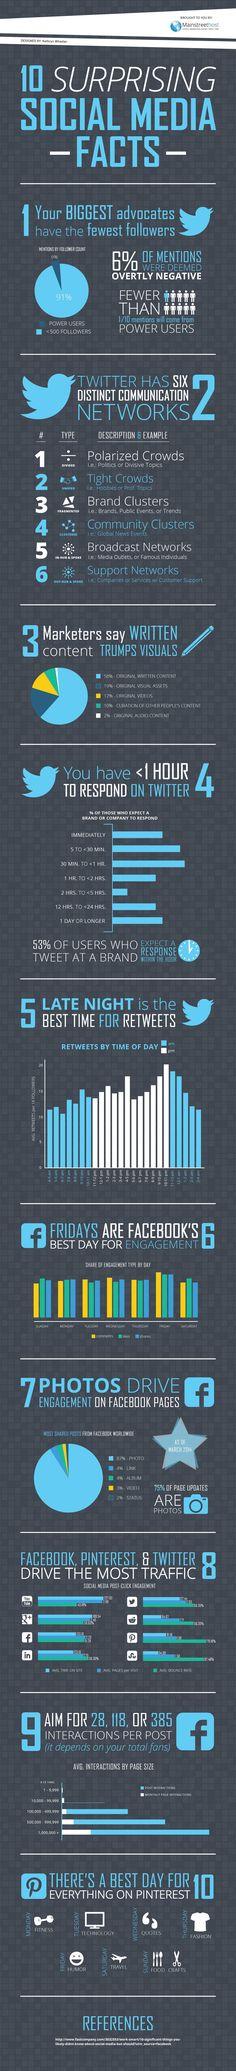 10 Surprising Social Media Facts   #infographic #Twitter #Facebook #Pinterest